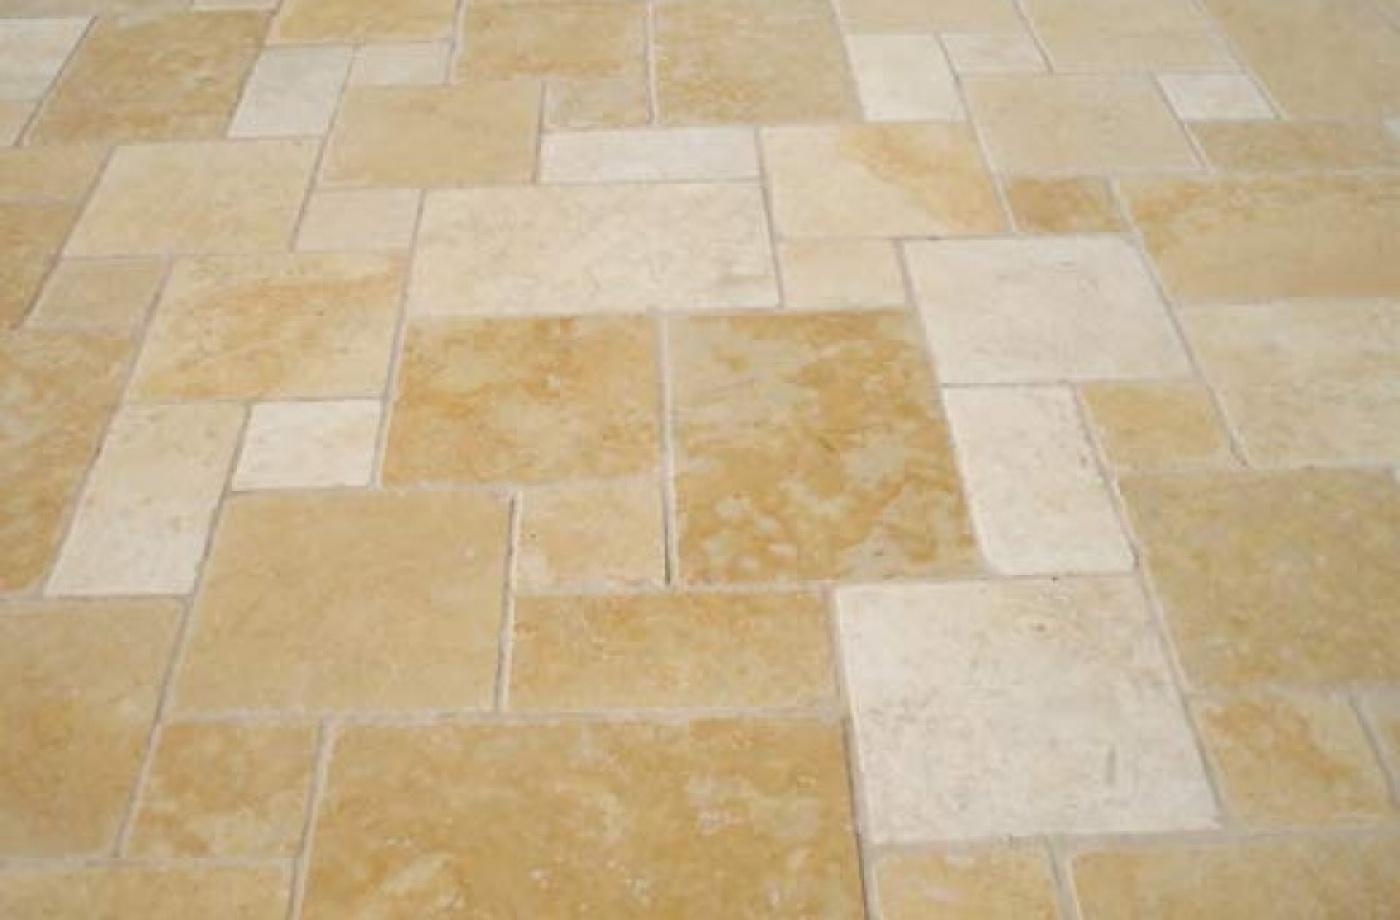 Flooring Kobra Granite 60x60x2 Flamed Finished Kobra Marbrerie De La Crau Pierre Marbre Granit Quartz Ardoise Dallages Revetements Cuisine Et Bains